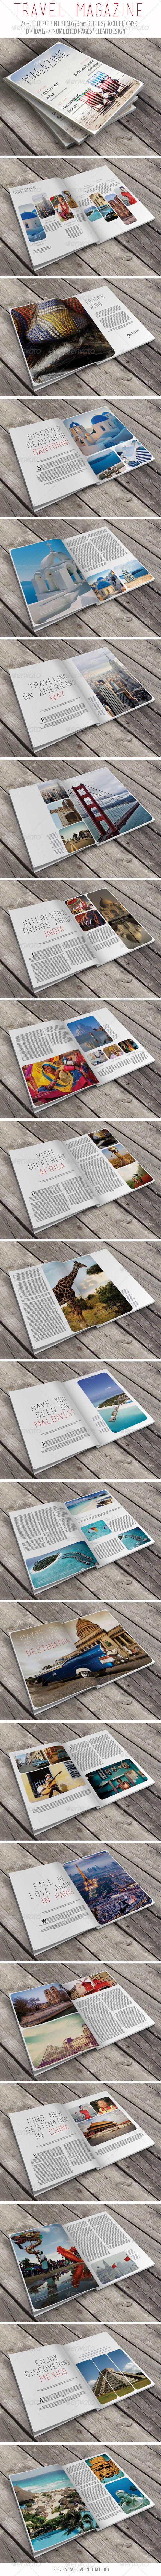 GraphicRiver Travel Magazine 6643750